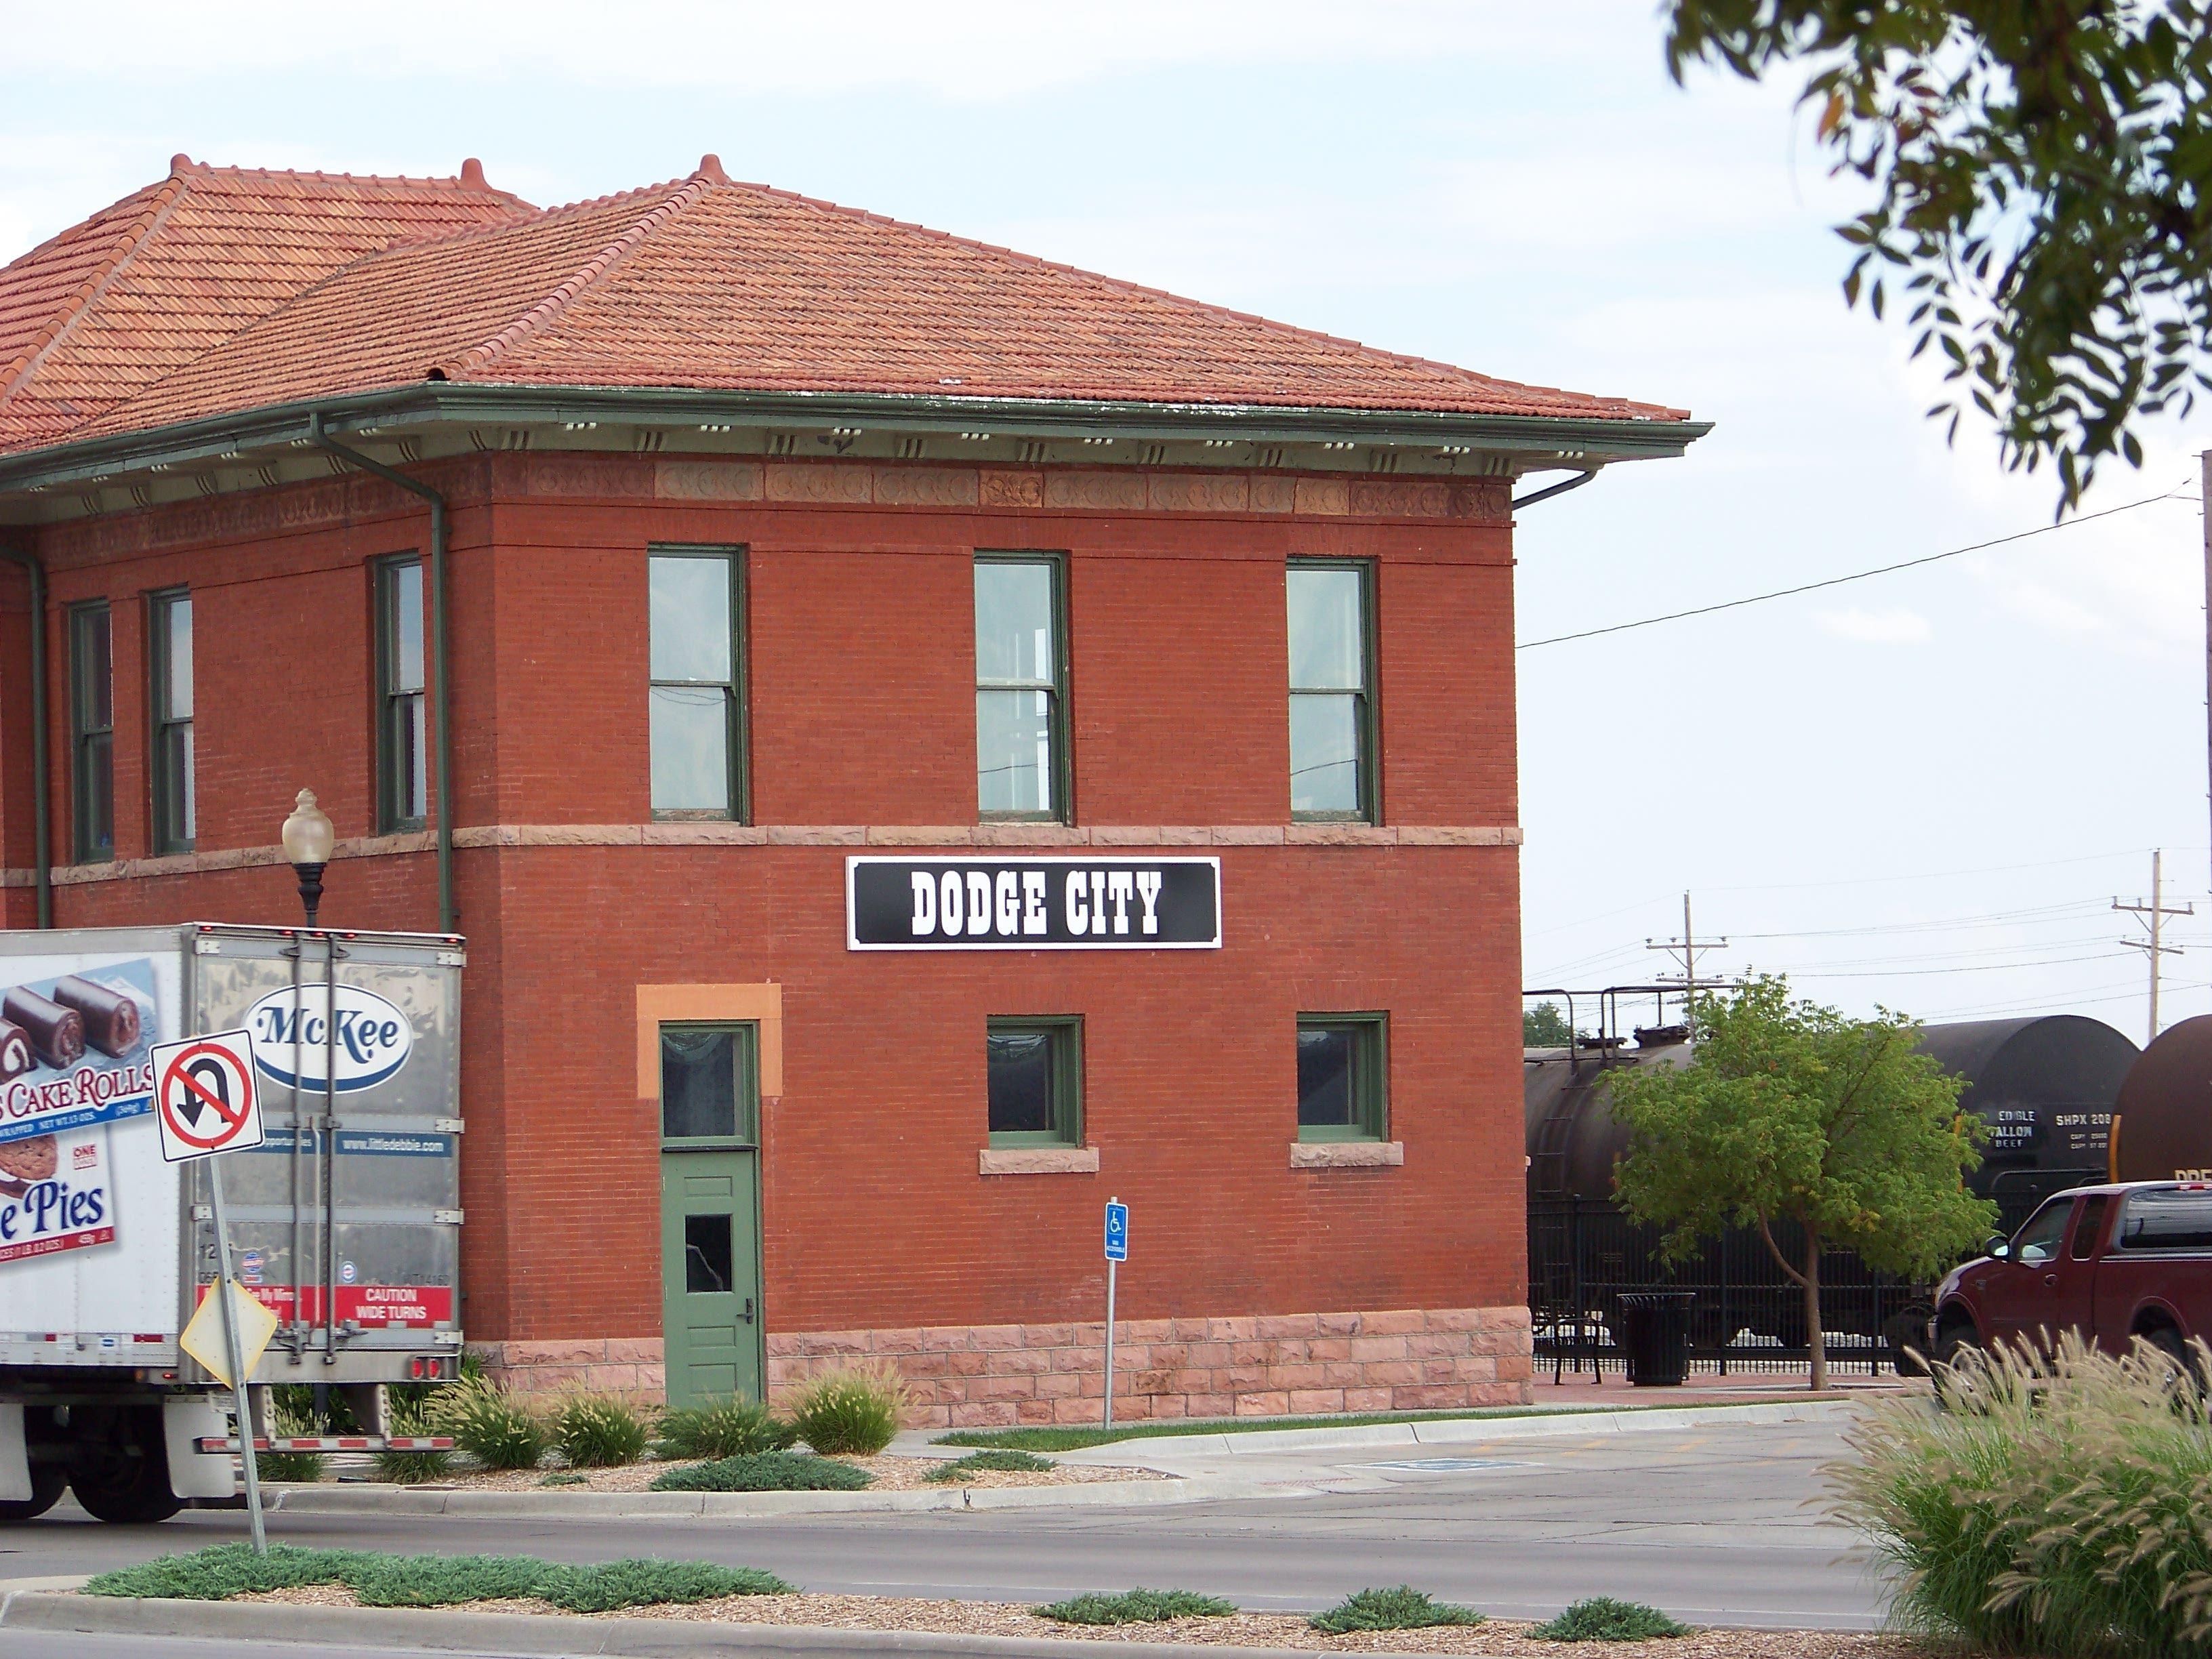 Dodge City Ks Train Depot Www Visitdodgecity Org With Images